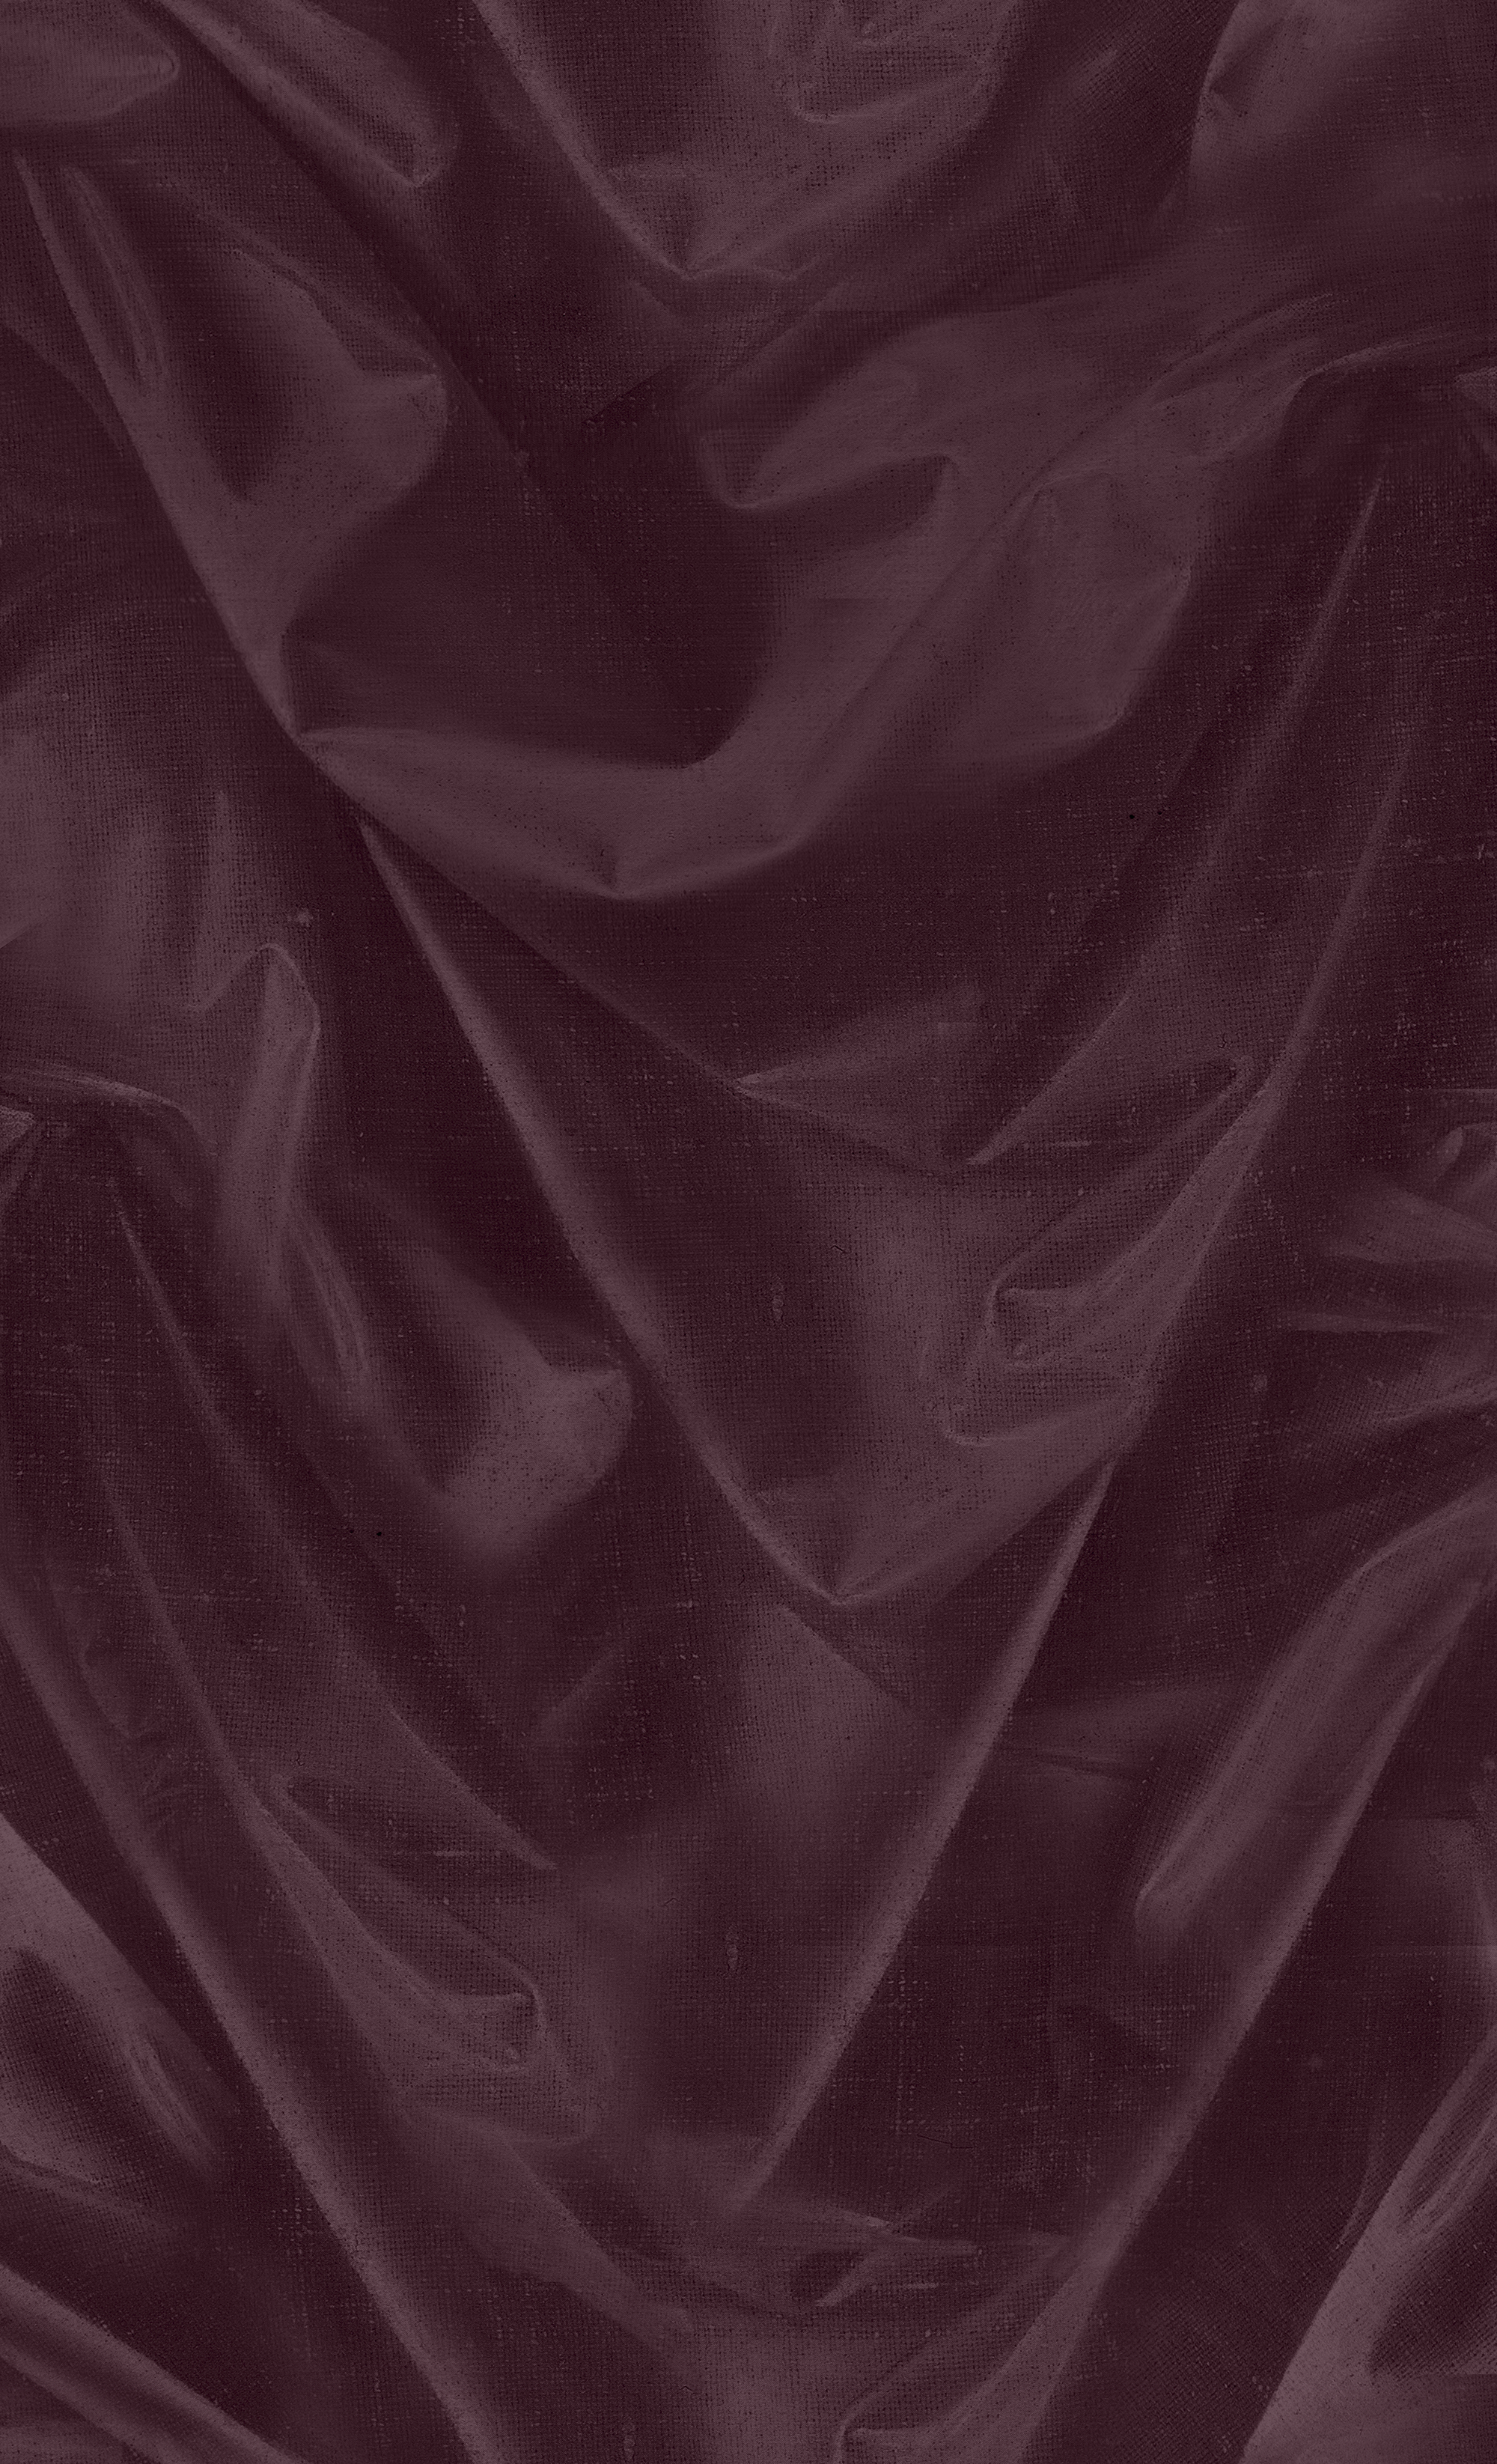 drape print red file.jpg